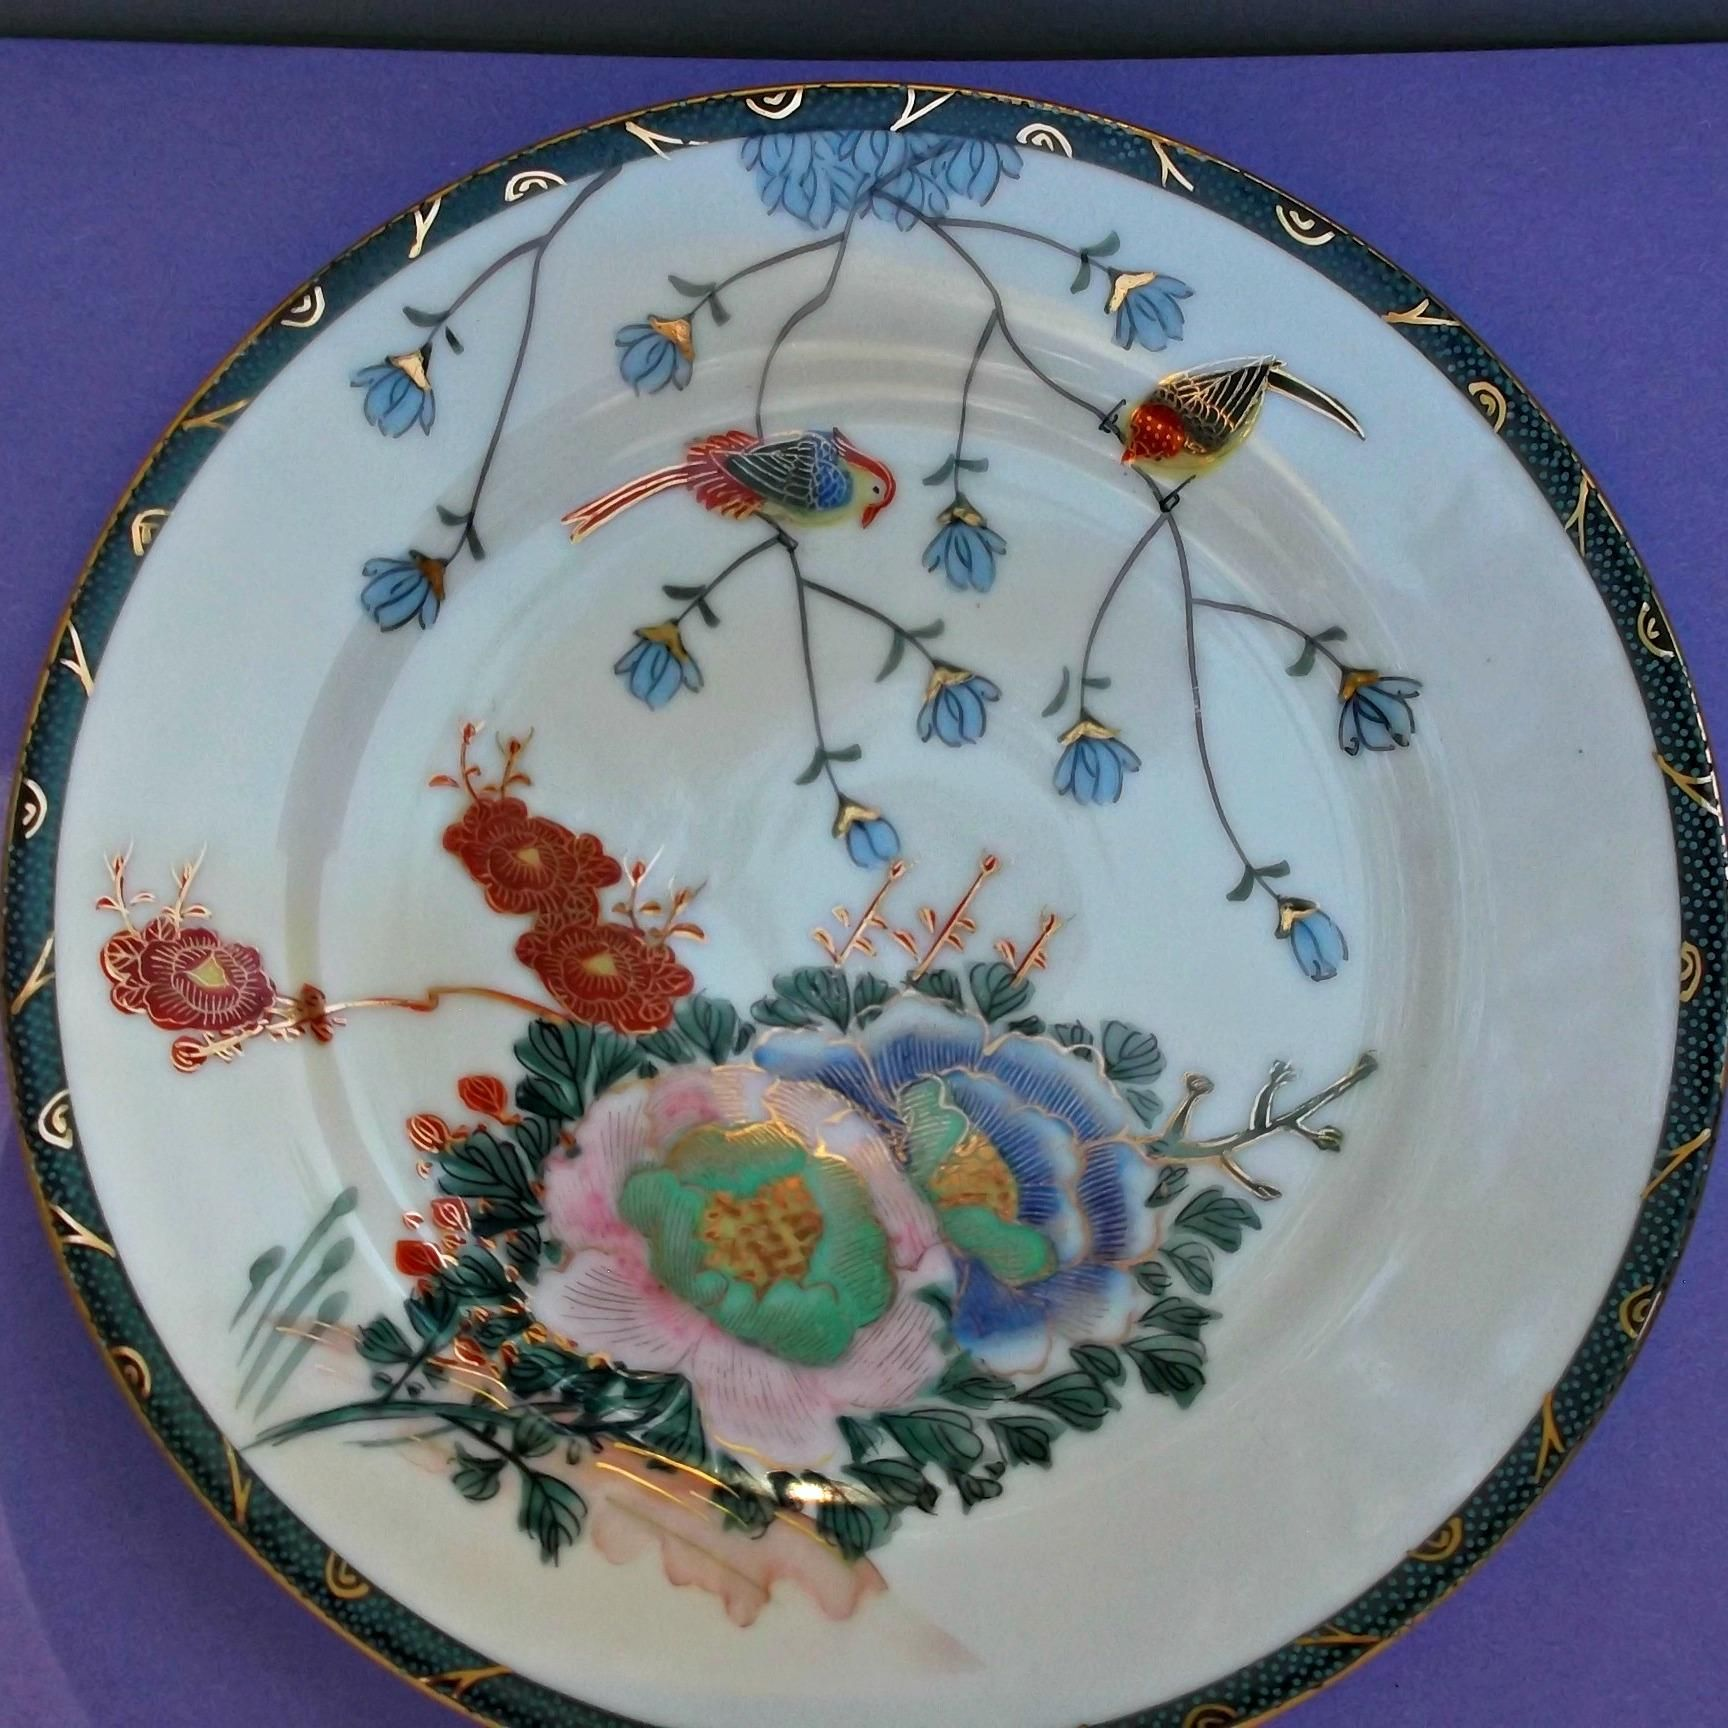 Set of Six Vintage Asian Decorative Plates Flowers Birds Gold Gilt & Set of Six Vintage Asian Decorative Plates Flowers Birds Gold Gilt ...